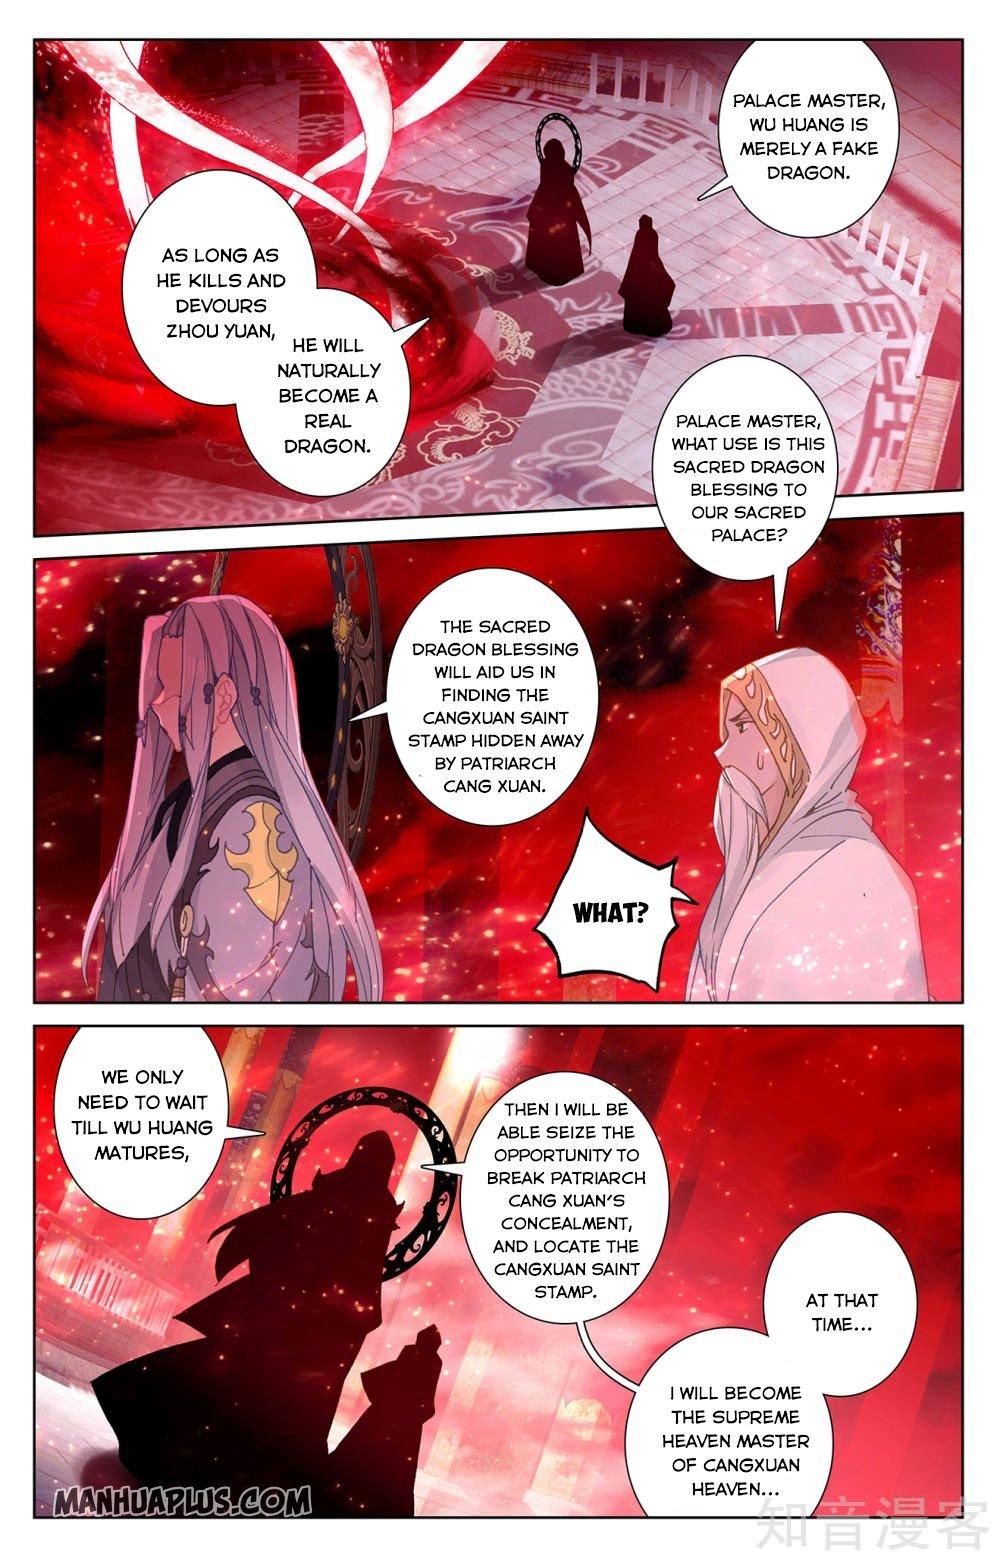 https://img3.nineanime.com/comics/pic4/30/20830/2472356/fe18079274936860daa1bd2737ac1182.jpg Page 1